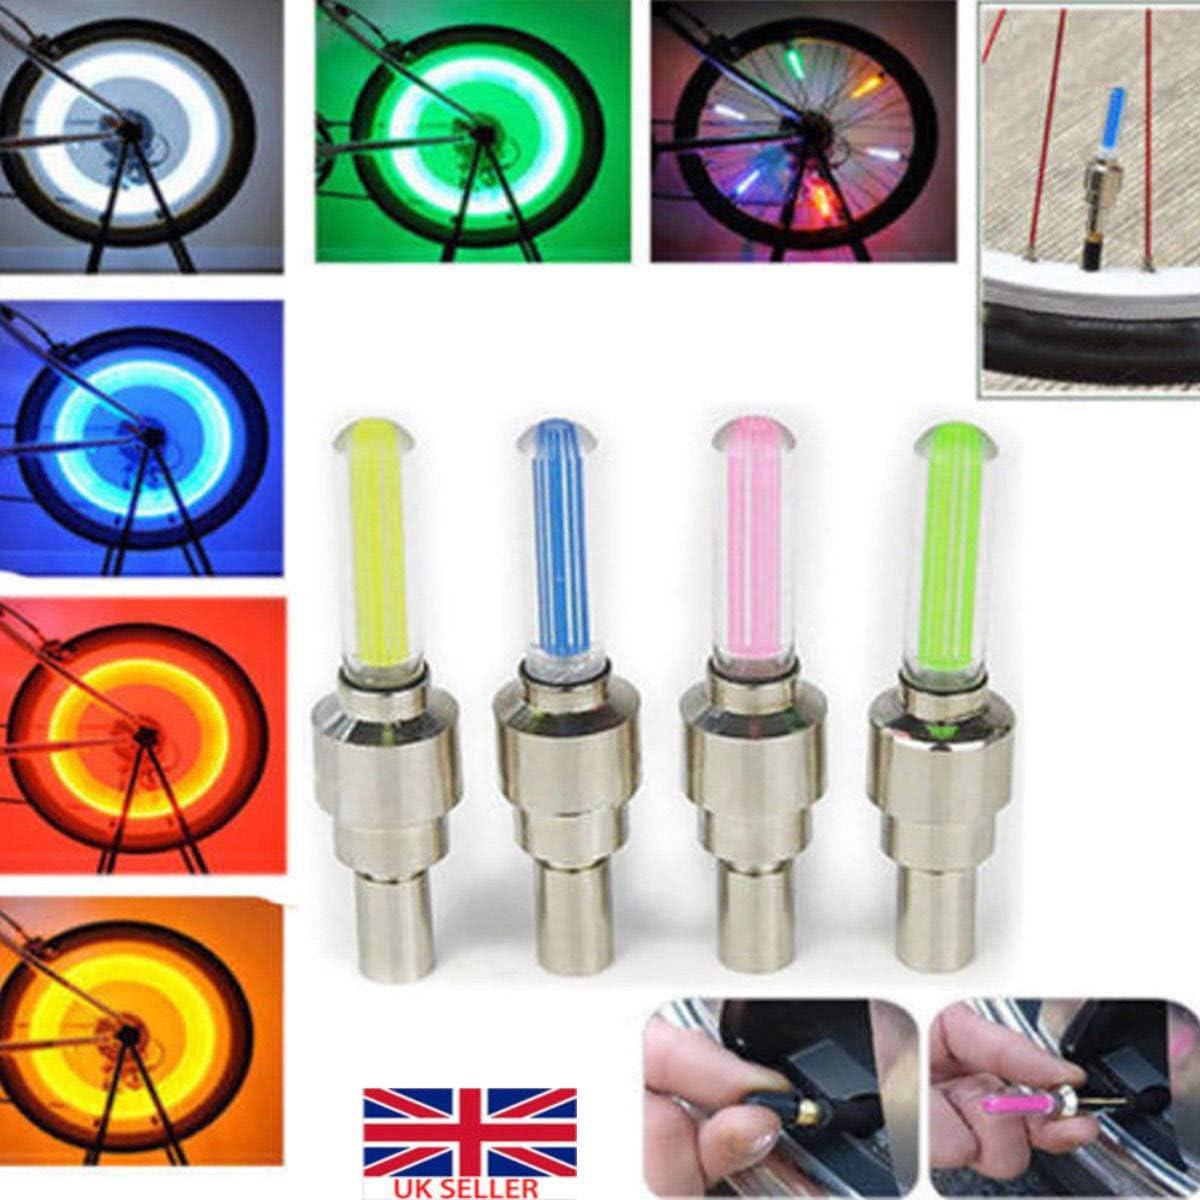 High Quality LED Tyre Wheel Light Shockproof Bike Bicycle Decor Lamp 3 Model